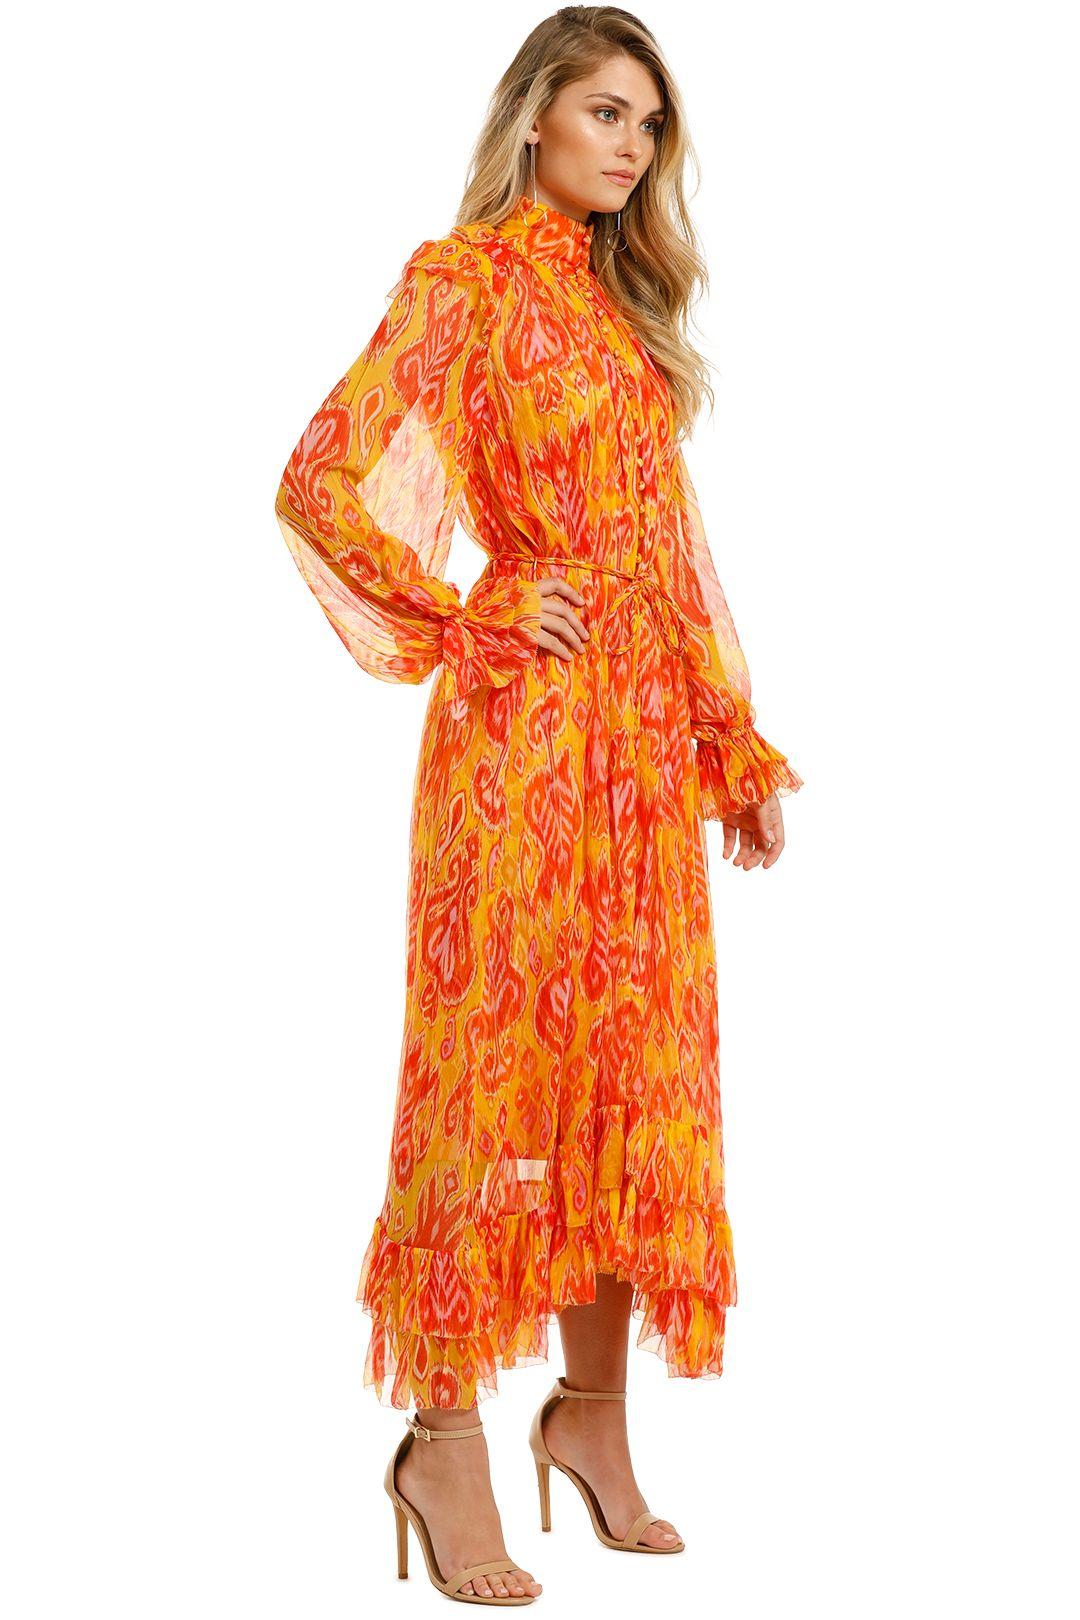 Zimmermann-Brightside-Frilled-Midi-Dress-Golden-Ikat-Side